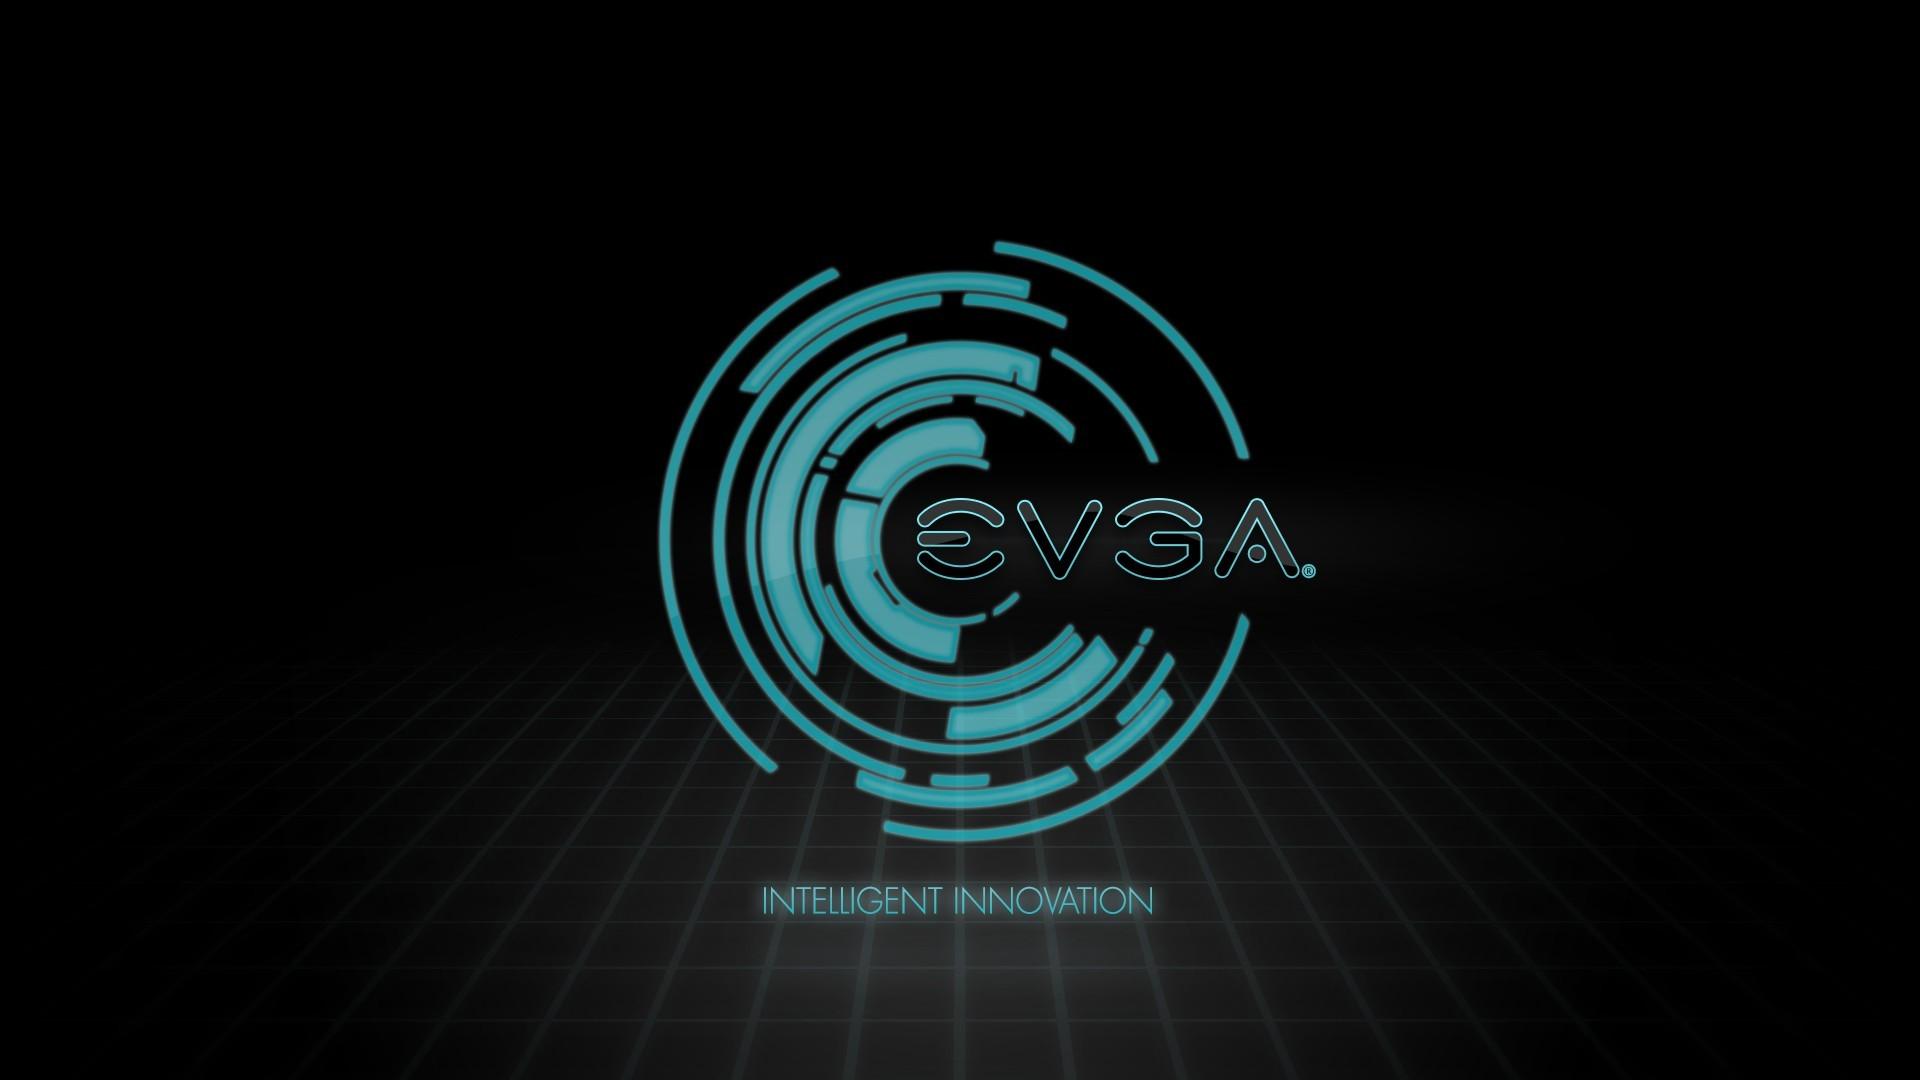 Evga Wallpapers Images - Wickedsa com